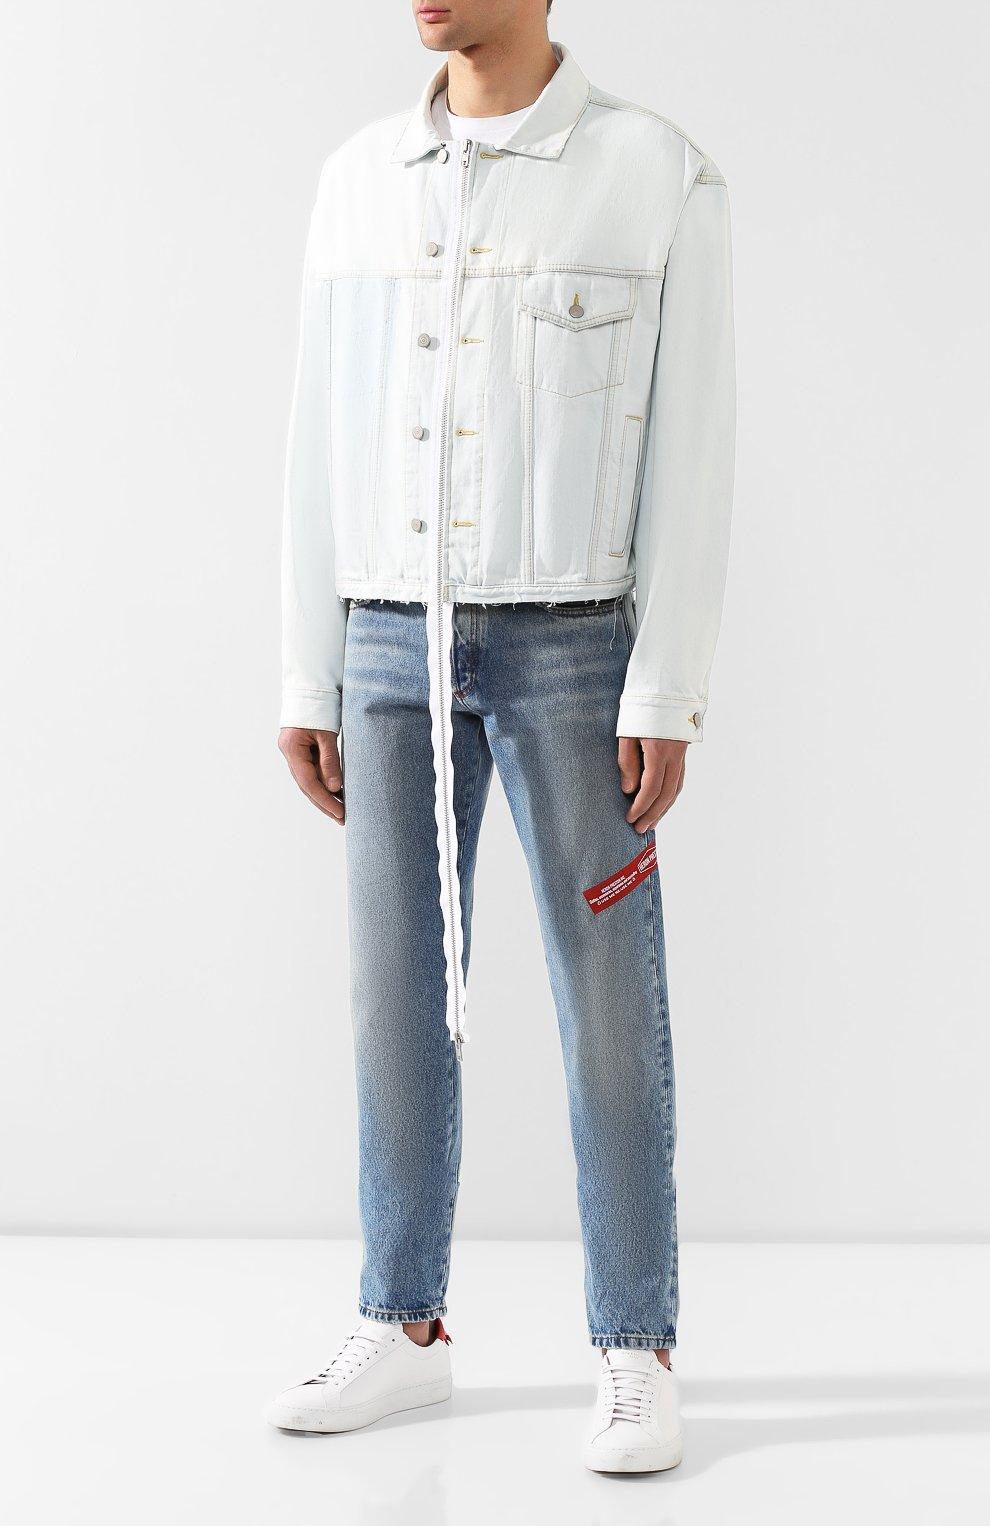 Комплект из плаща и куртки Maison Margiela бежевого цвета | Фото №6